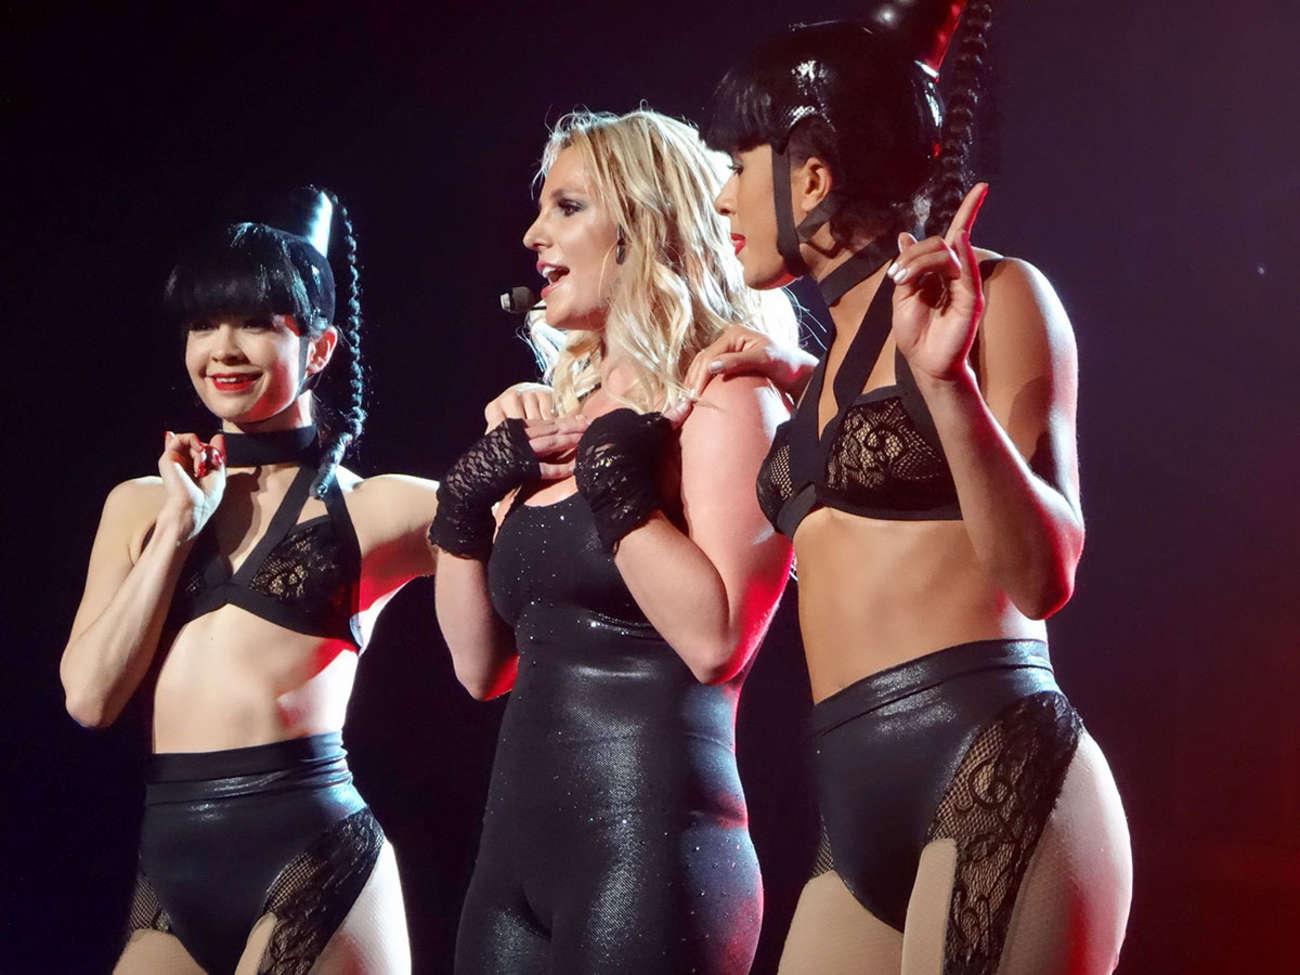 Britney-Spears-Piece-of-Me-Tour--13.jpg